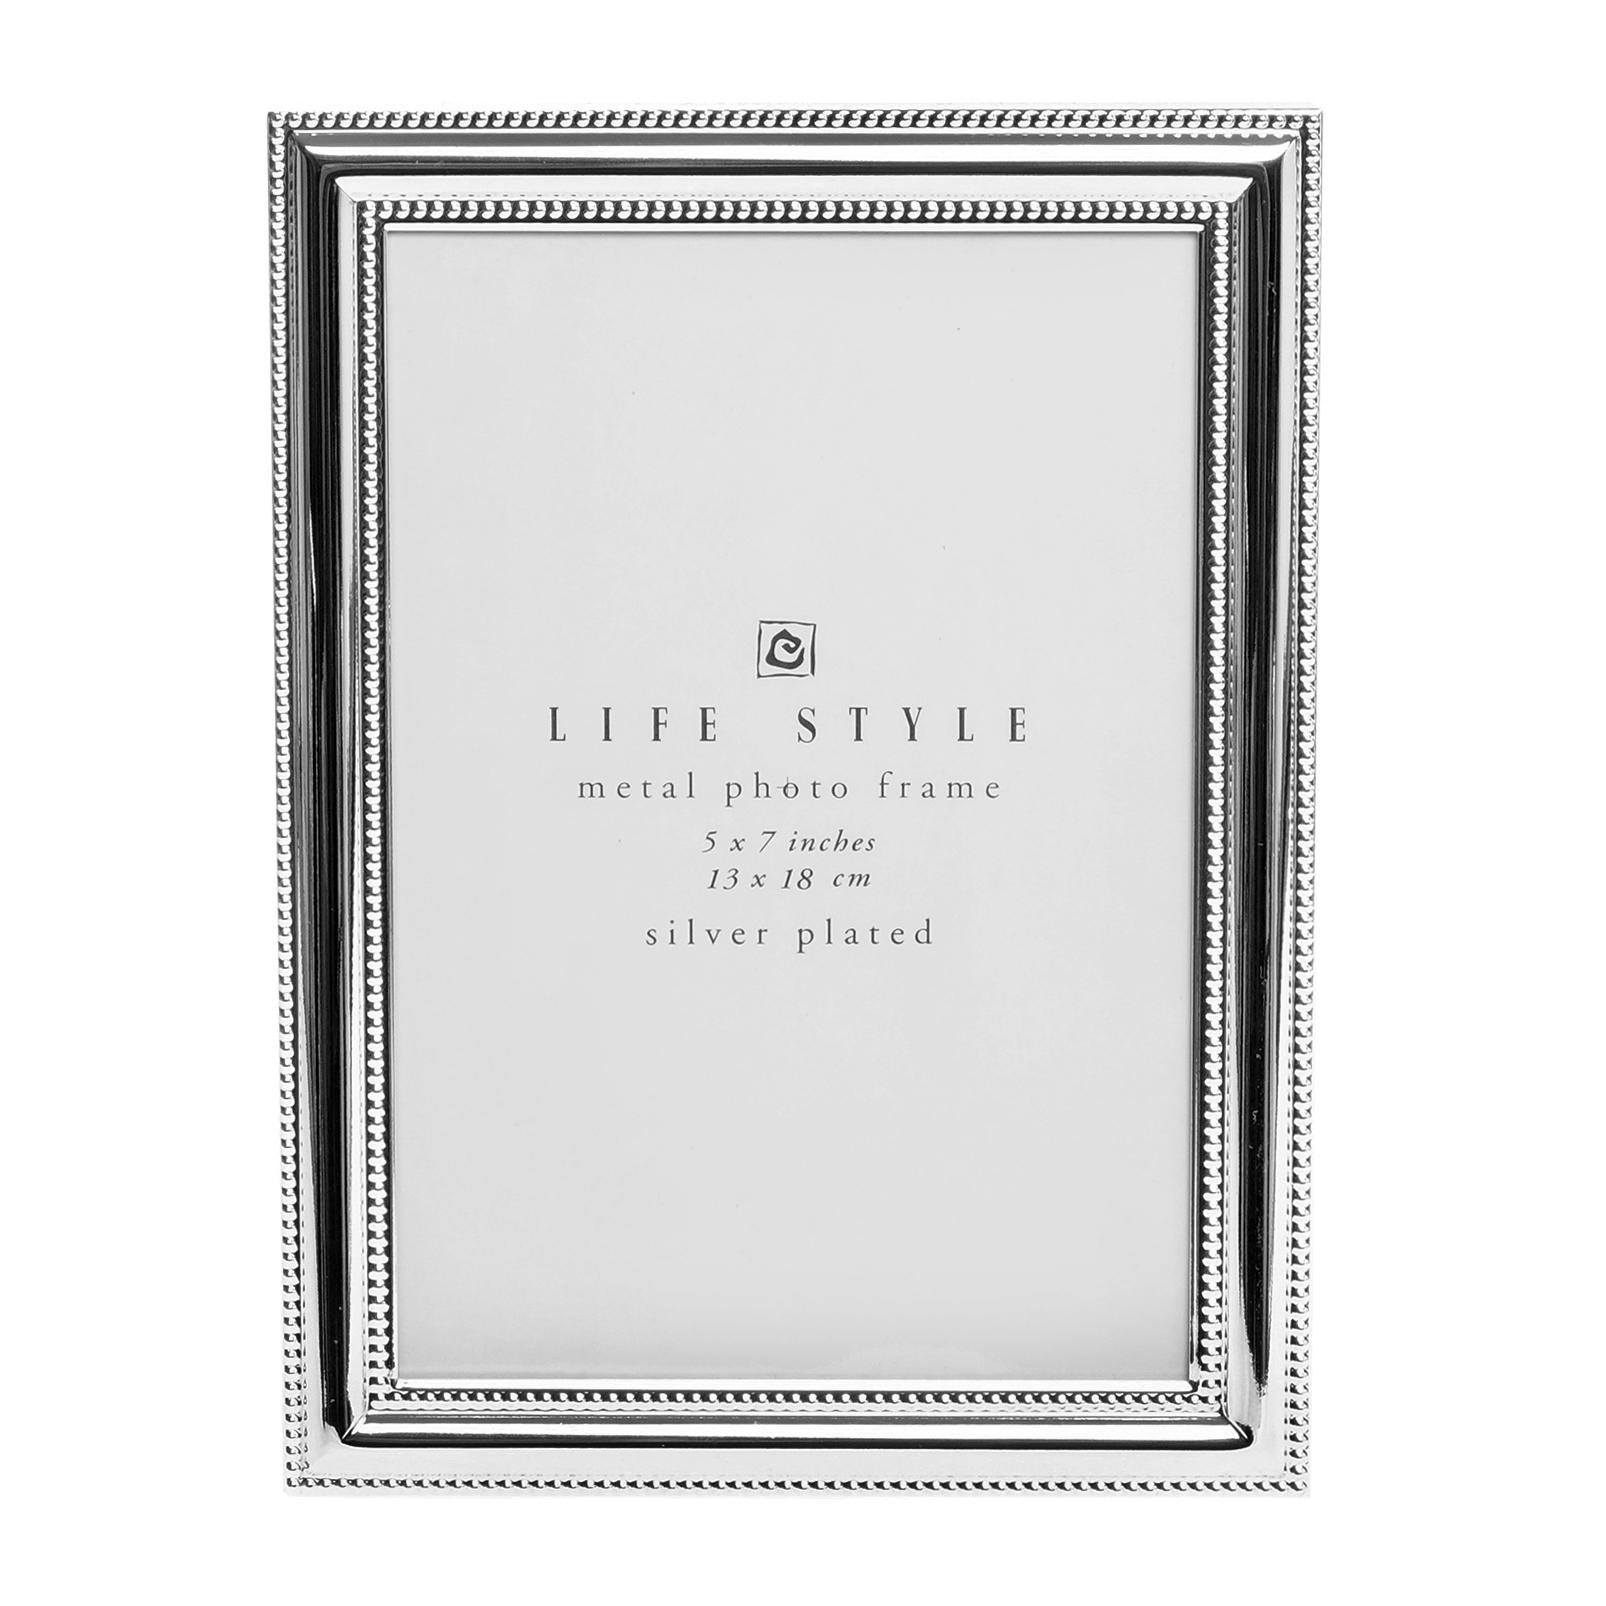 bilderrahmen fotorahmen versilbert gew lbt perlen optik metall 10x15 13x18 cm ebay. Black Bedroom Furniture Sets. Home Design Ideas